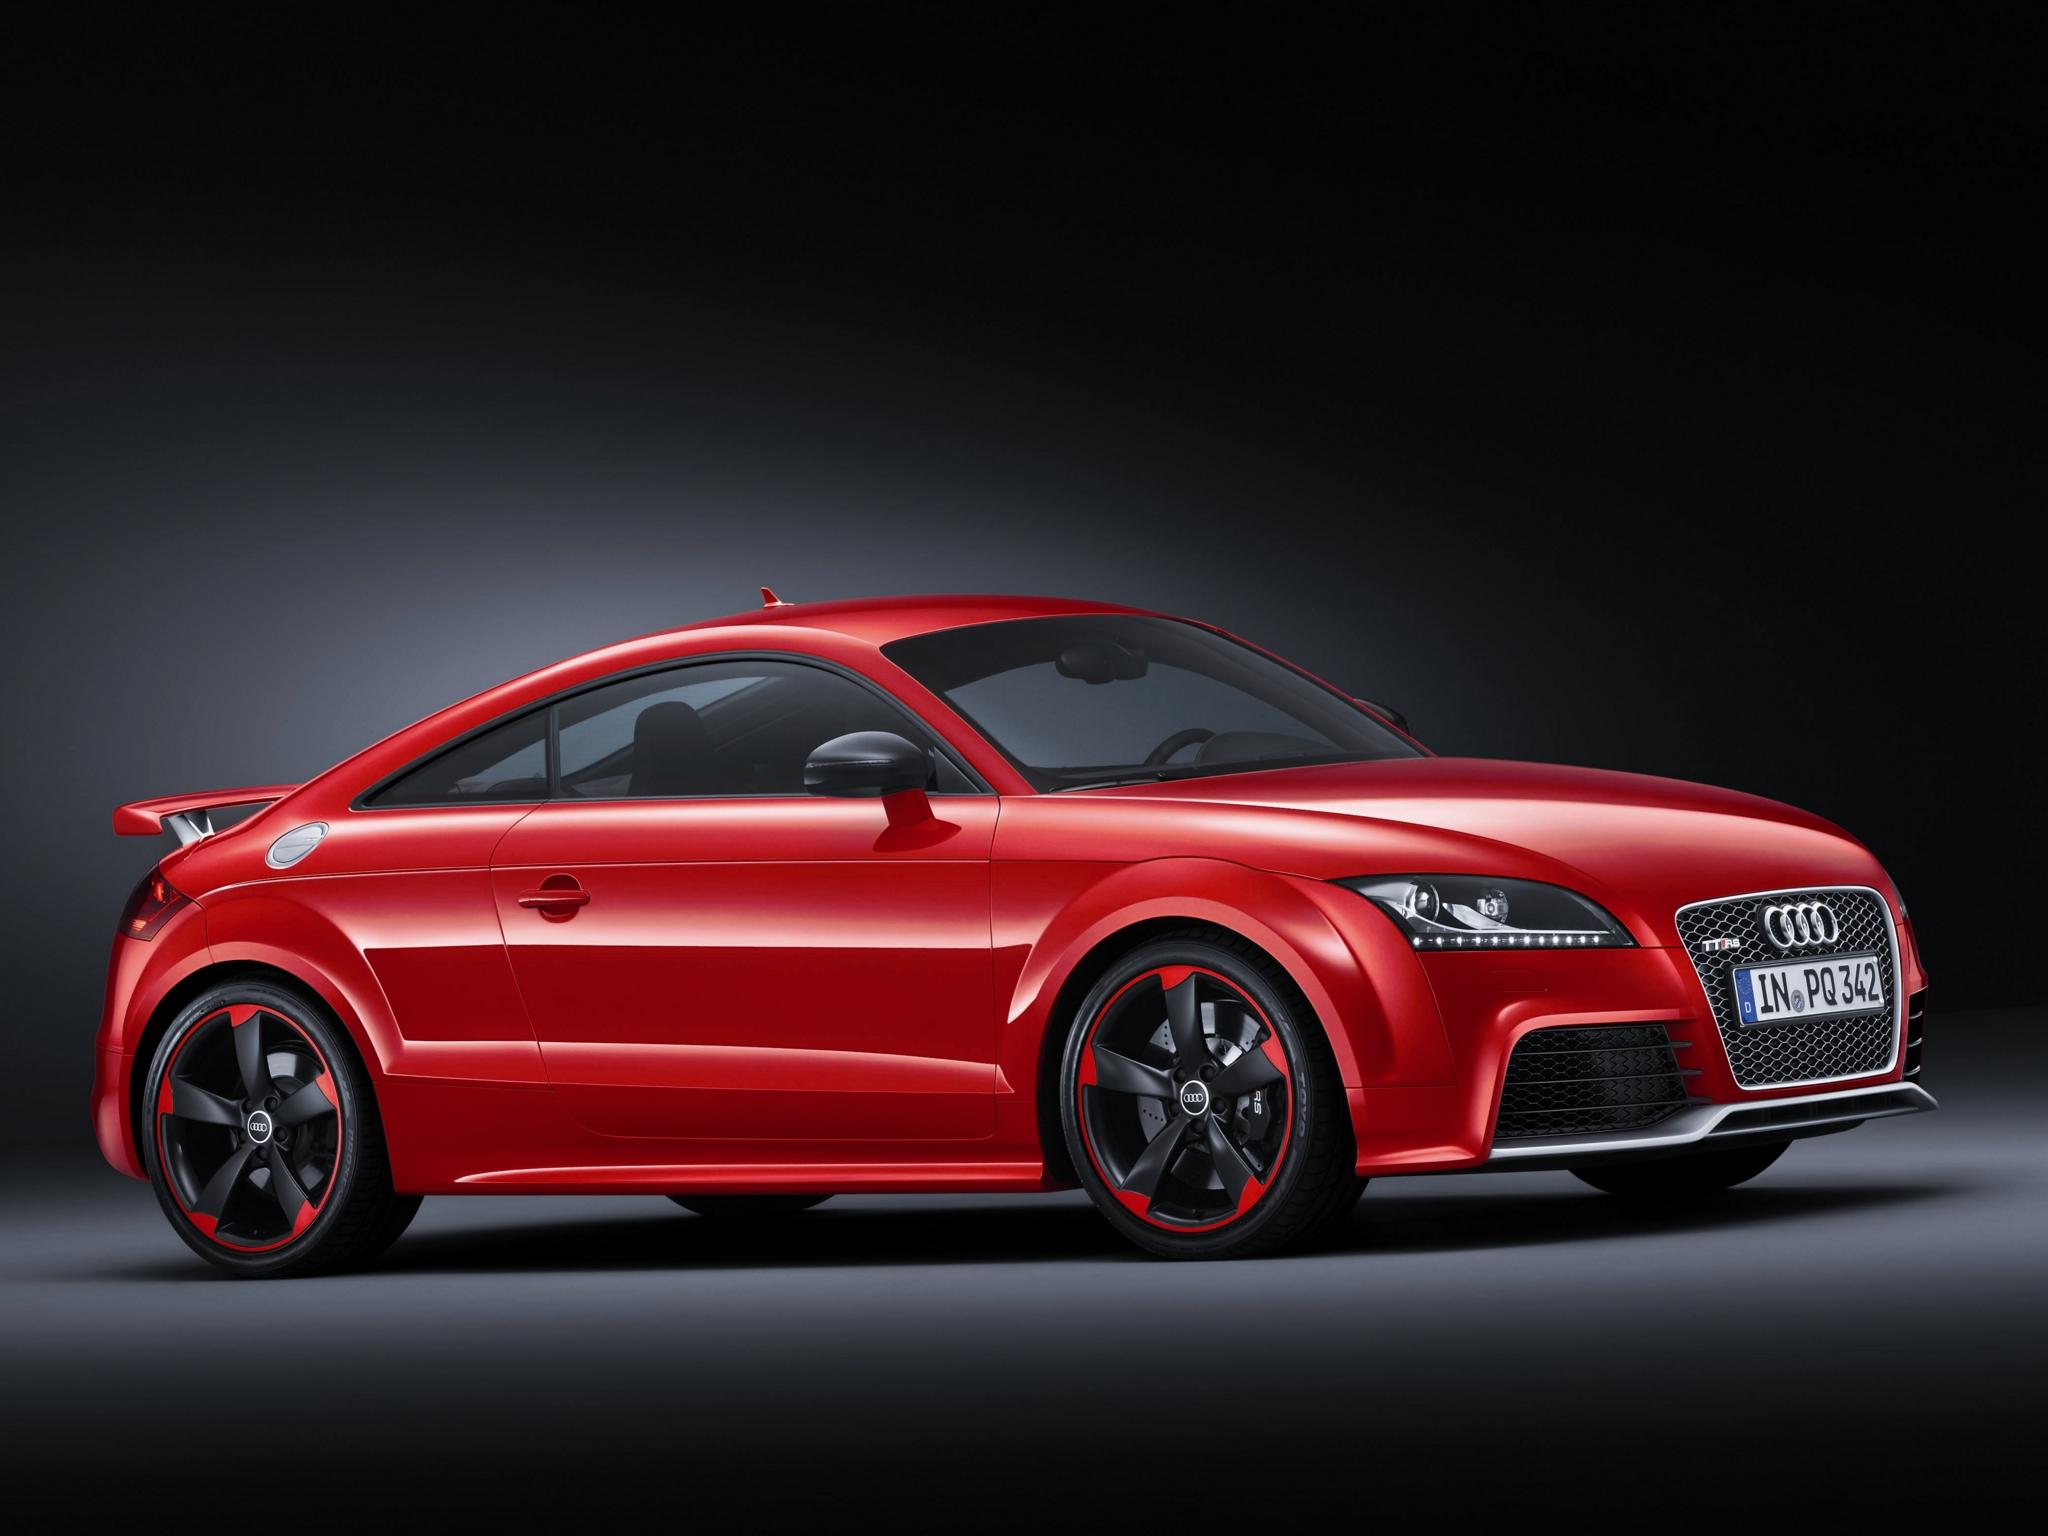 Audi Tt Rs Plus Coupe Wallpaper 4 Wallpapers   illinois liver 2048x1536